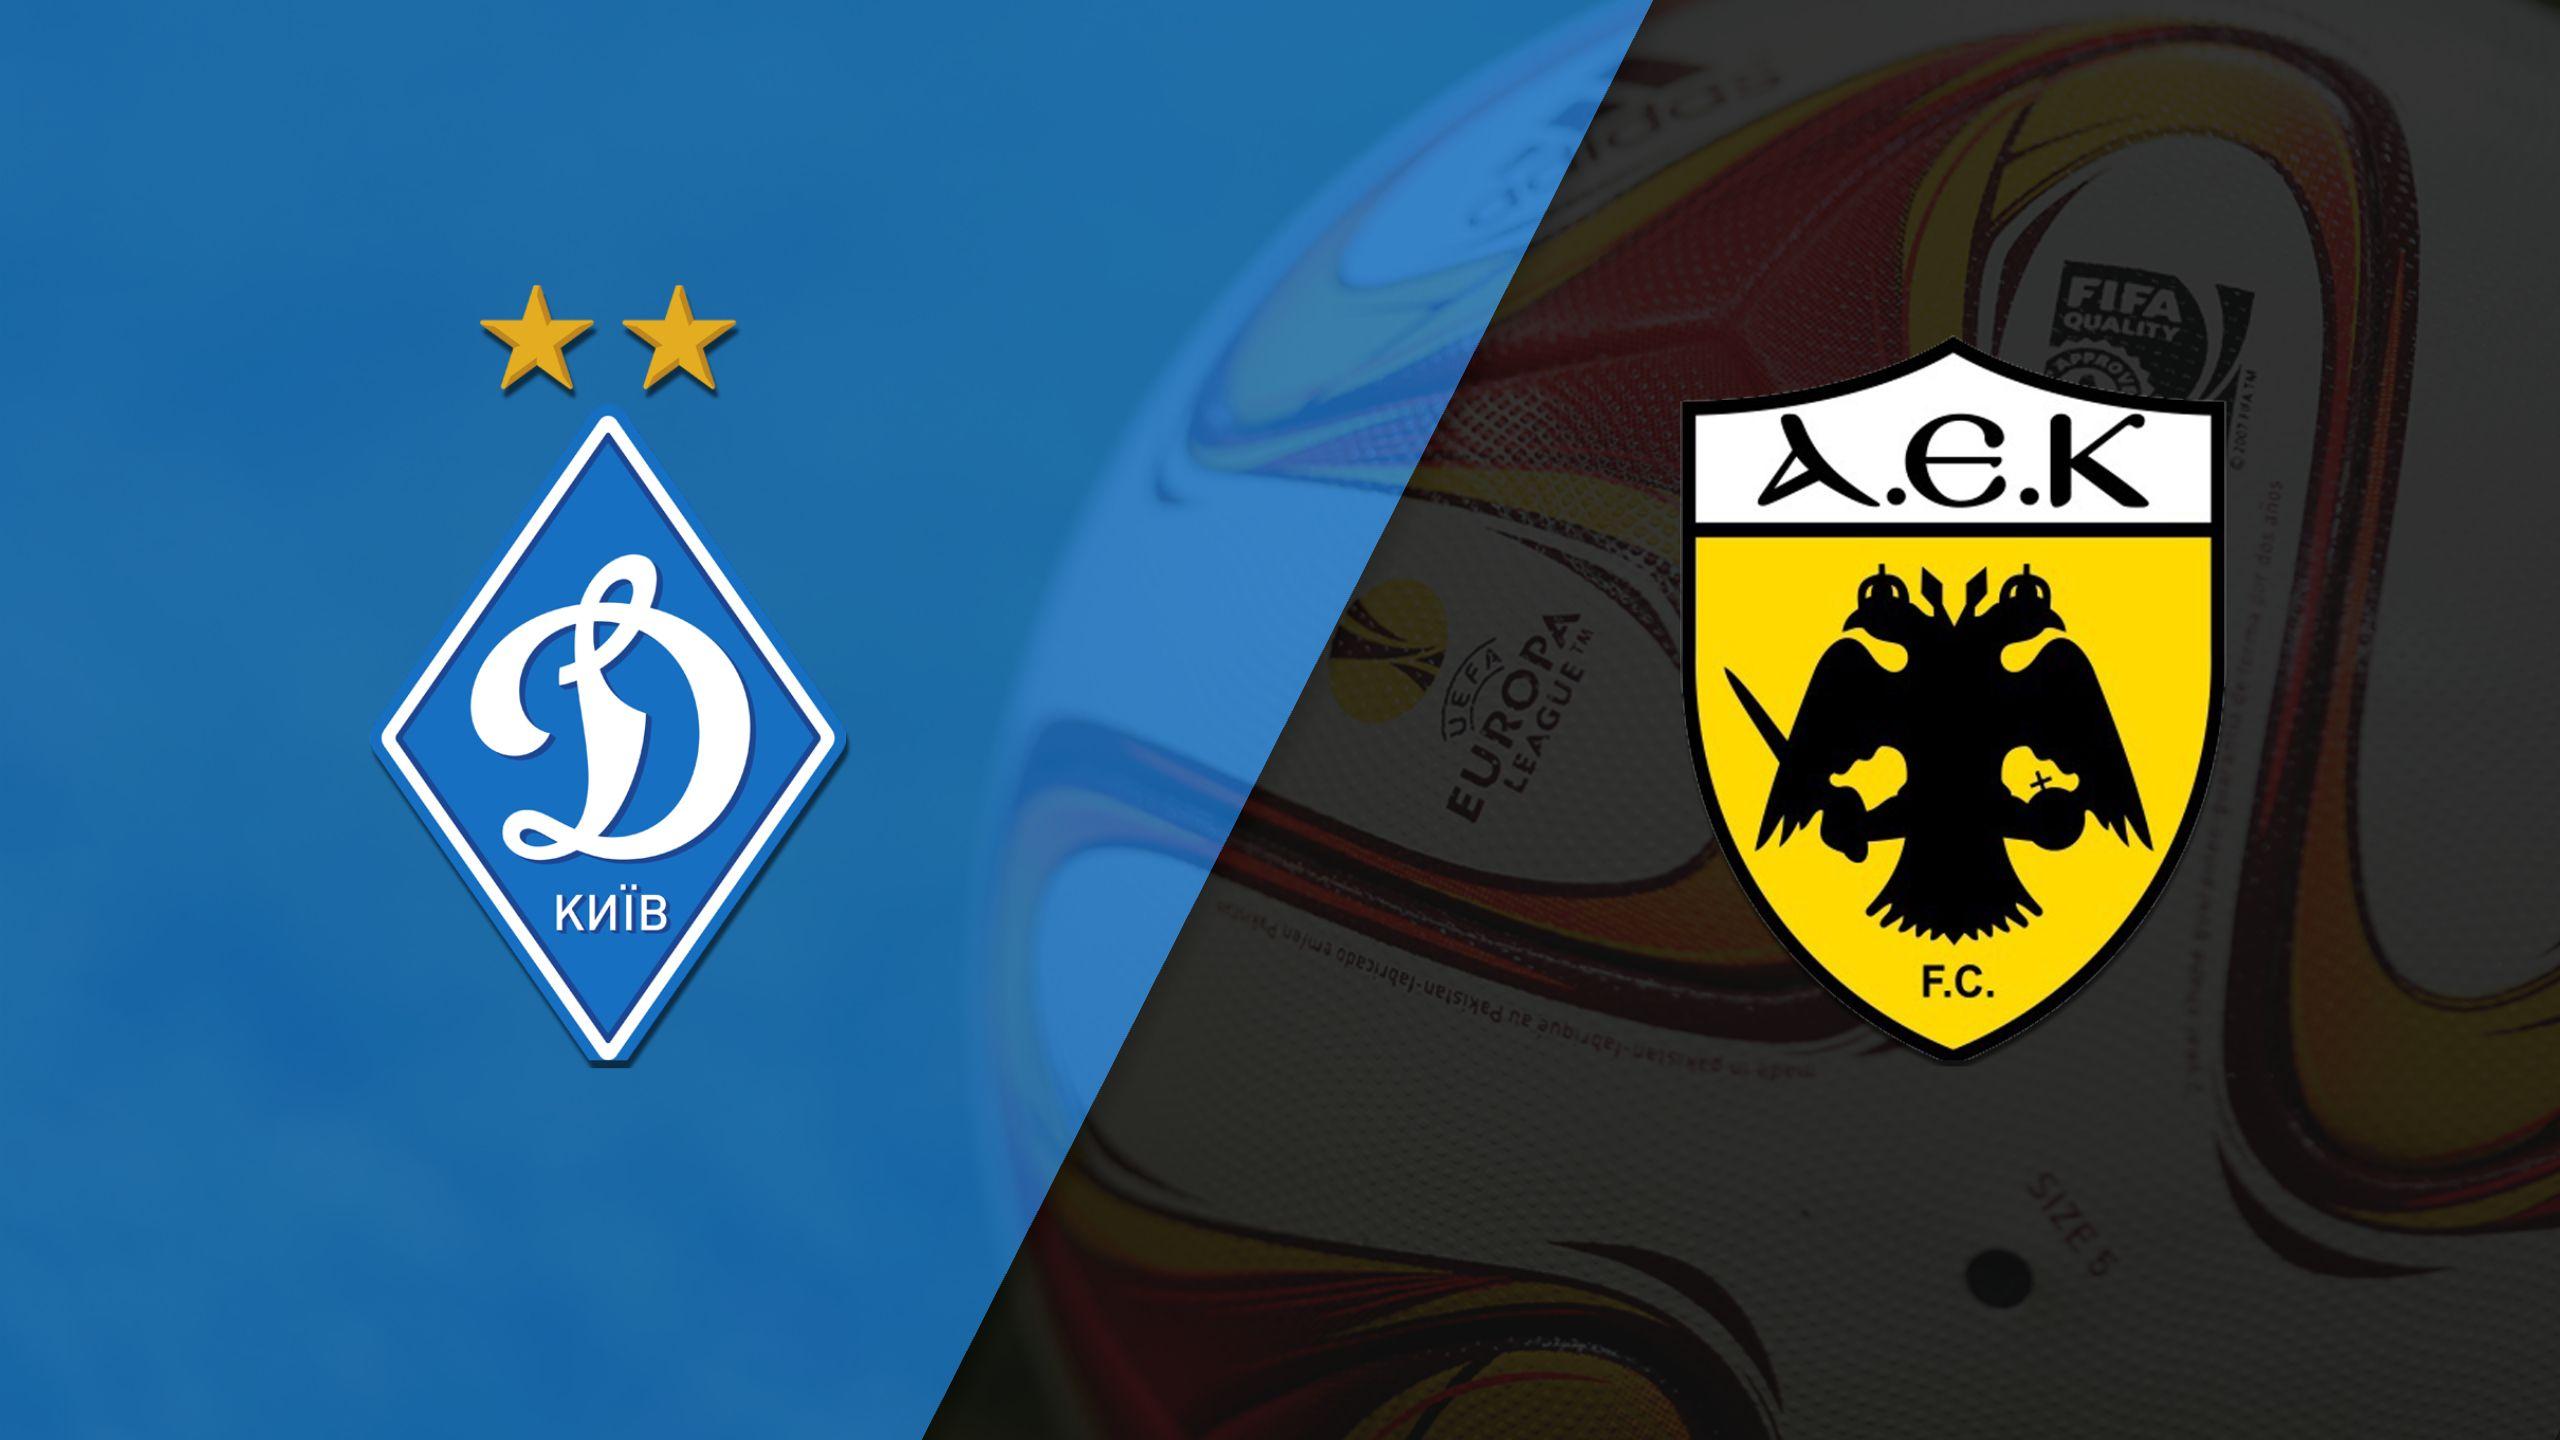 In Spanish - Dynamo Kiev vs. AEK Atenas (Round of 32, Second Leg) (UEFA Europa League)